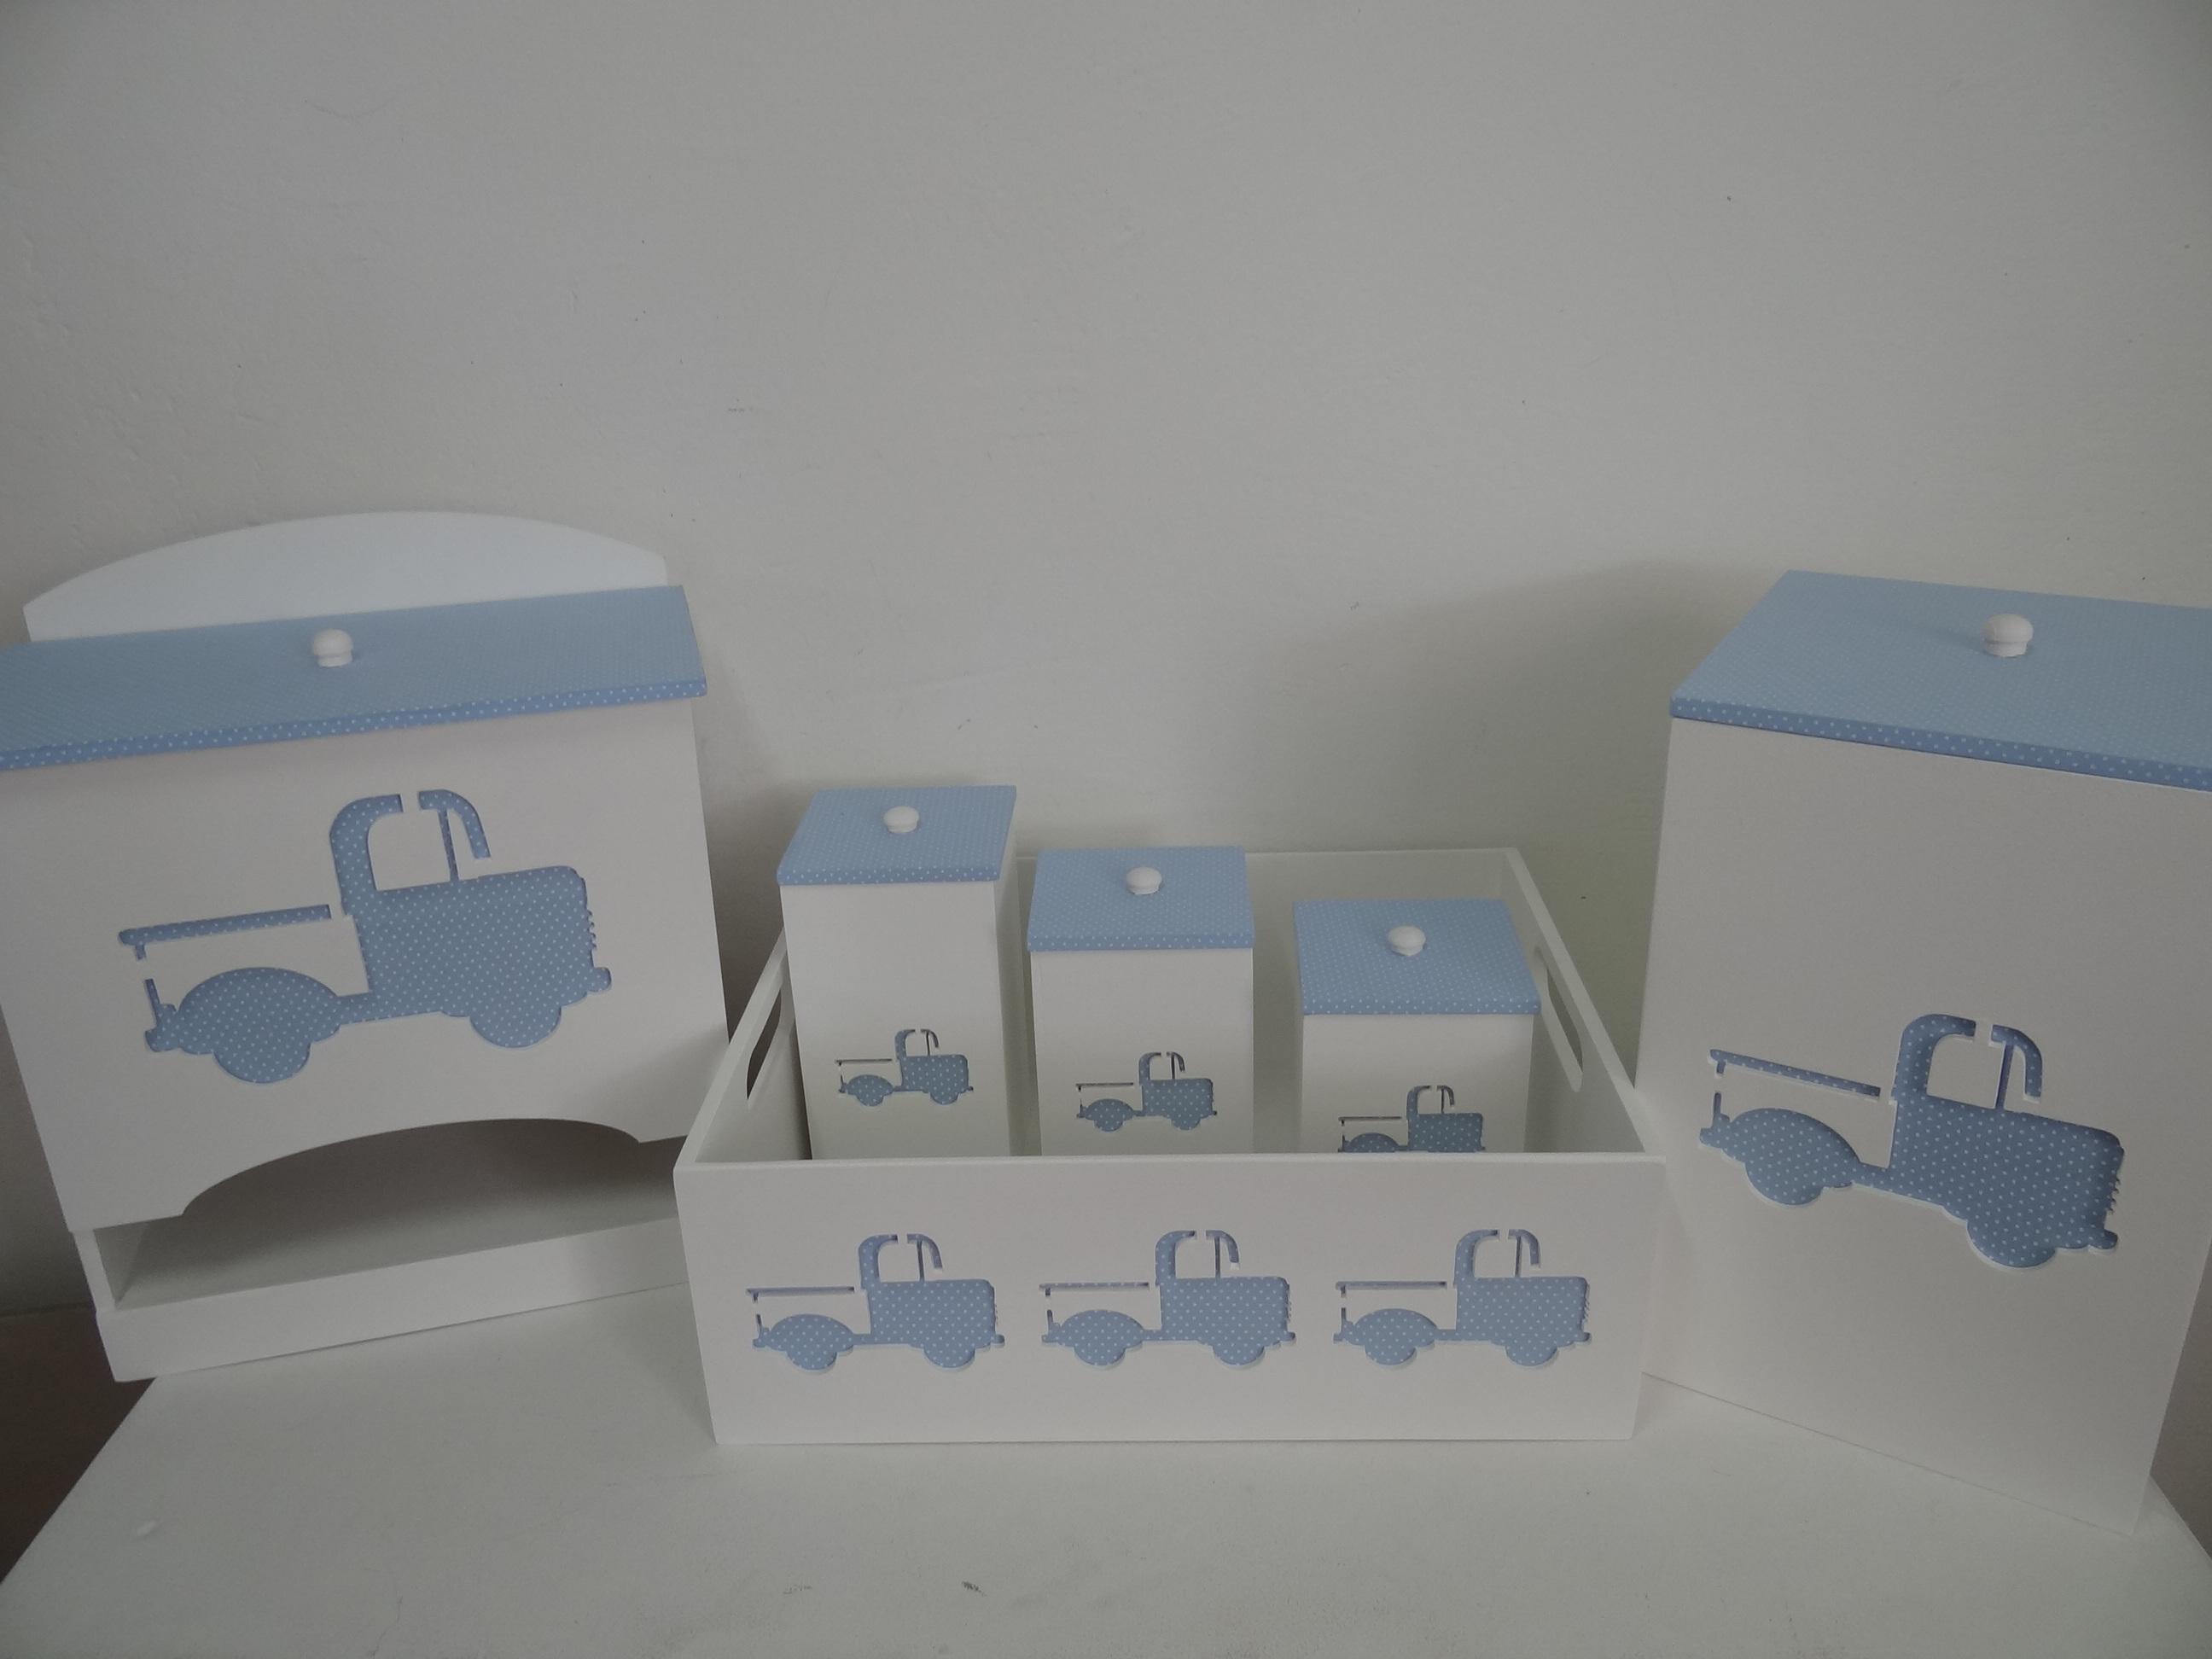 Kit Higiene Para Bebe Menino Azul Caixa Madeira Mdf Passa Fitas C 034